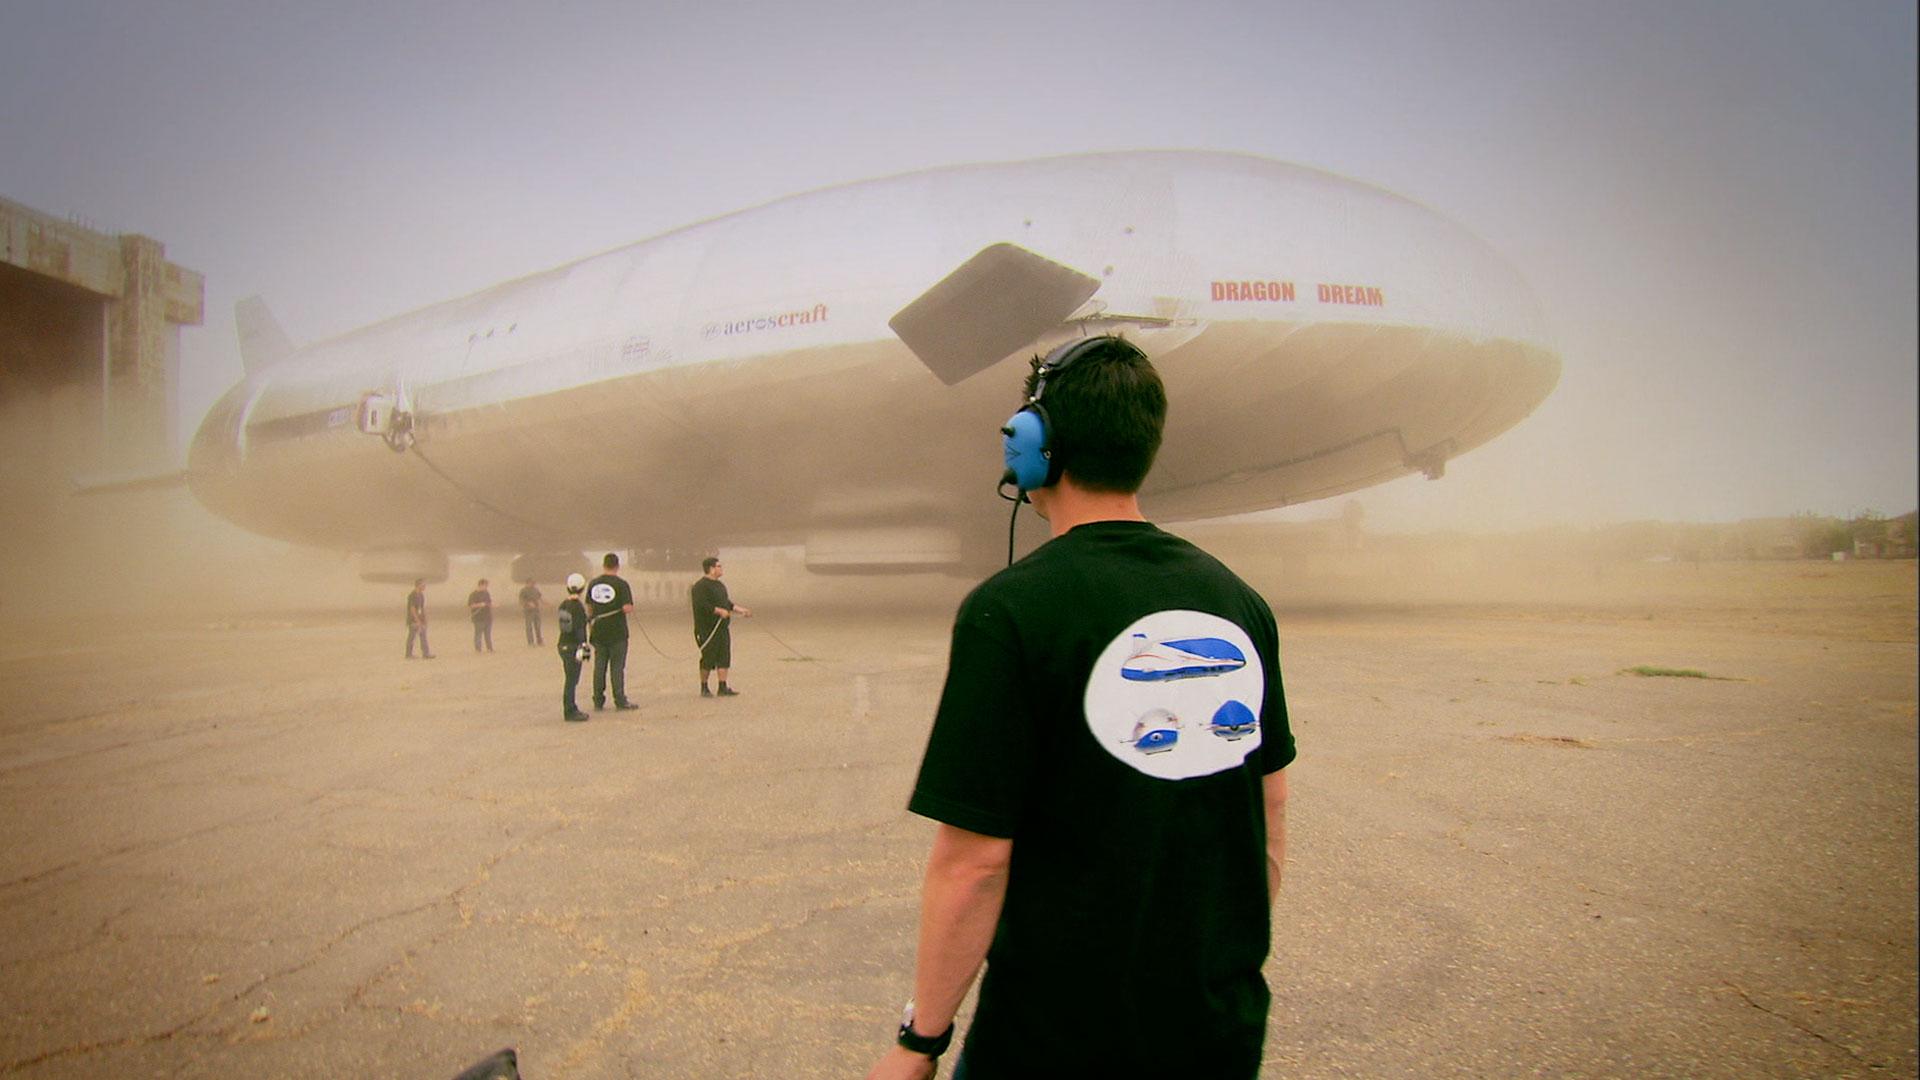 Super Airship